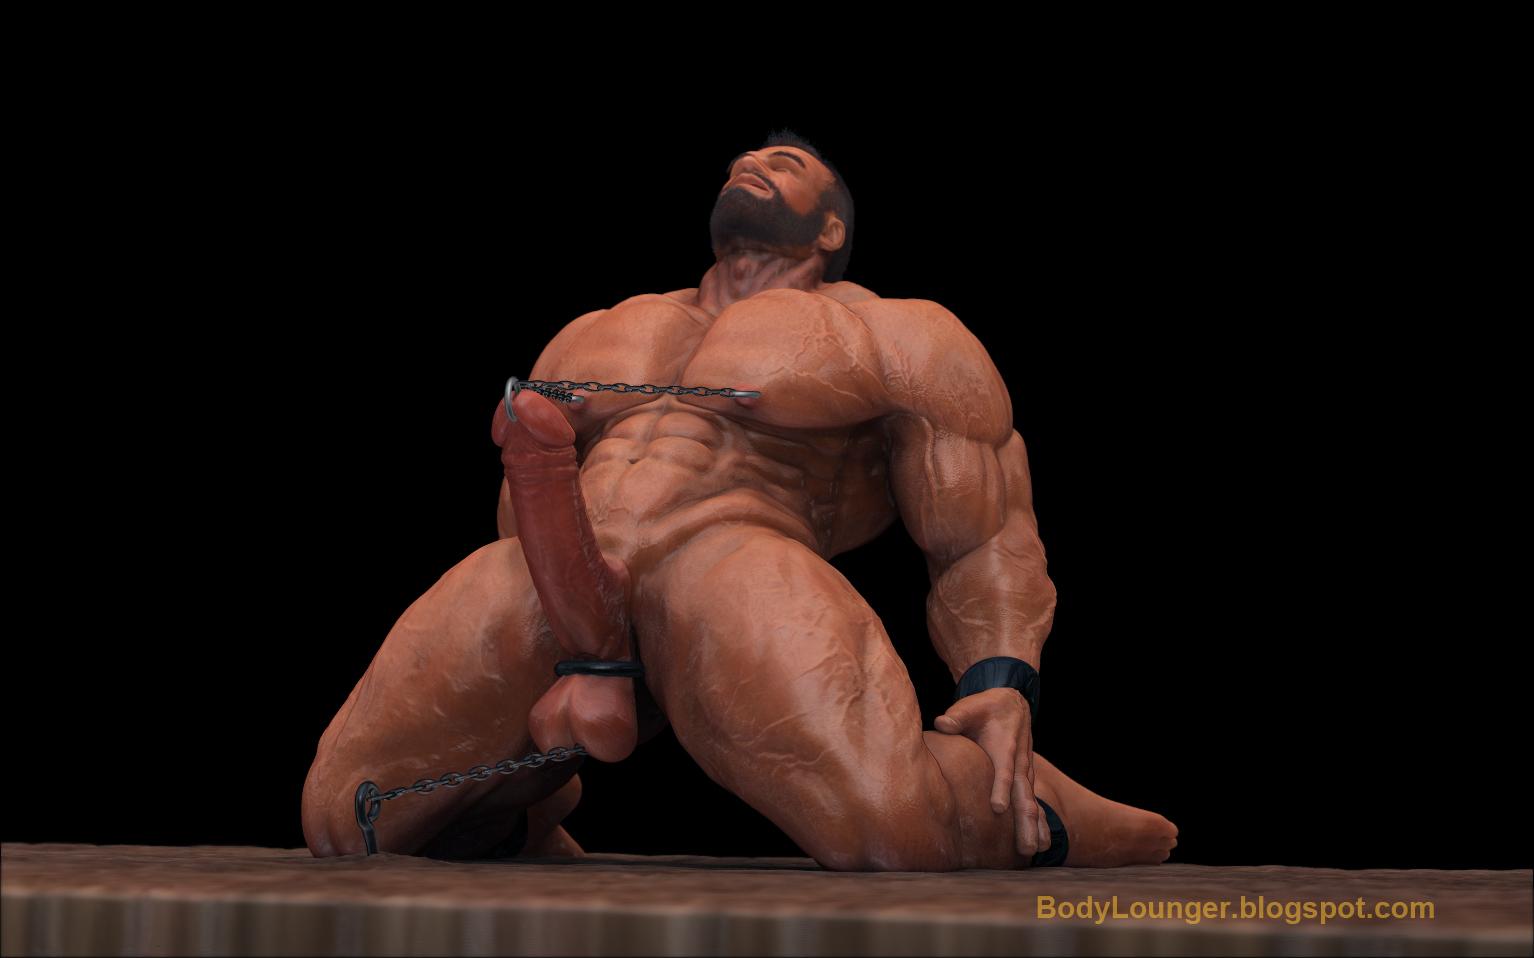 digital Body art lounger gay erotic